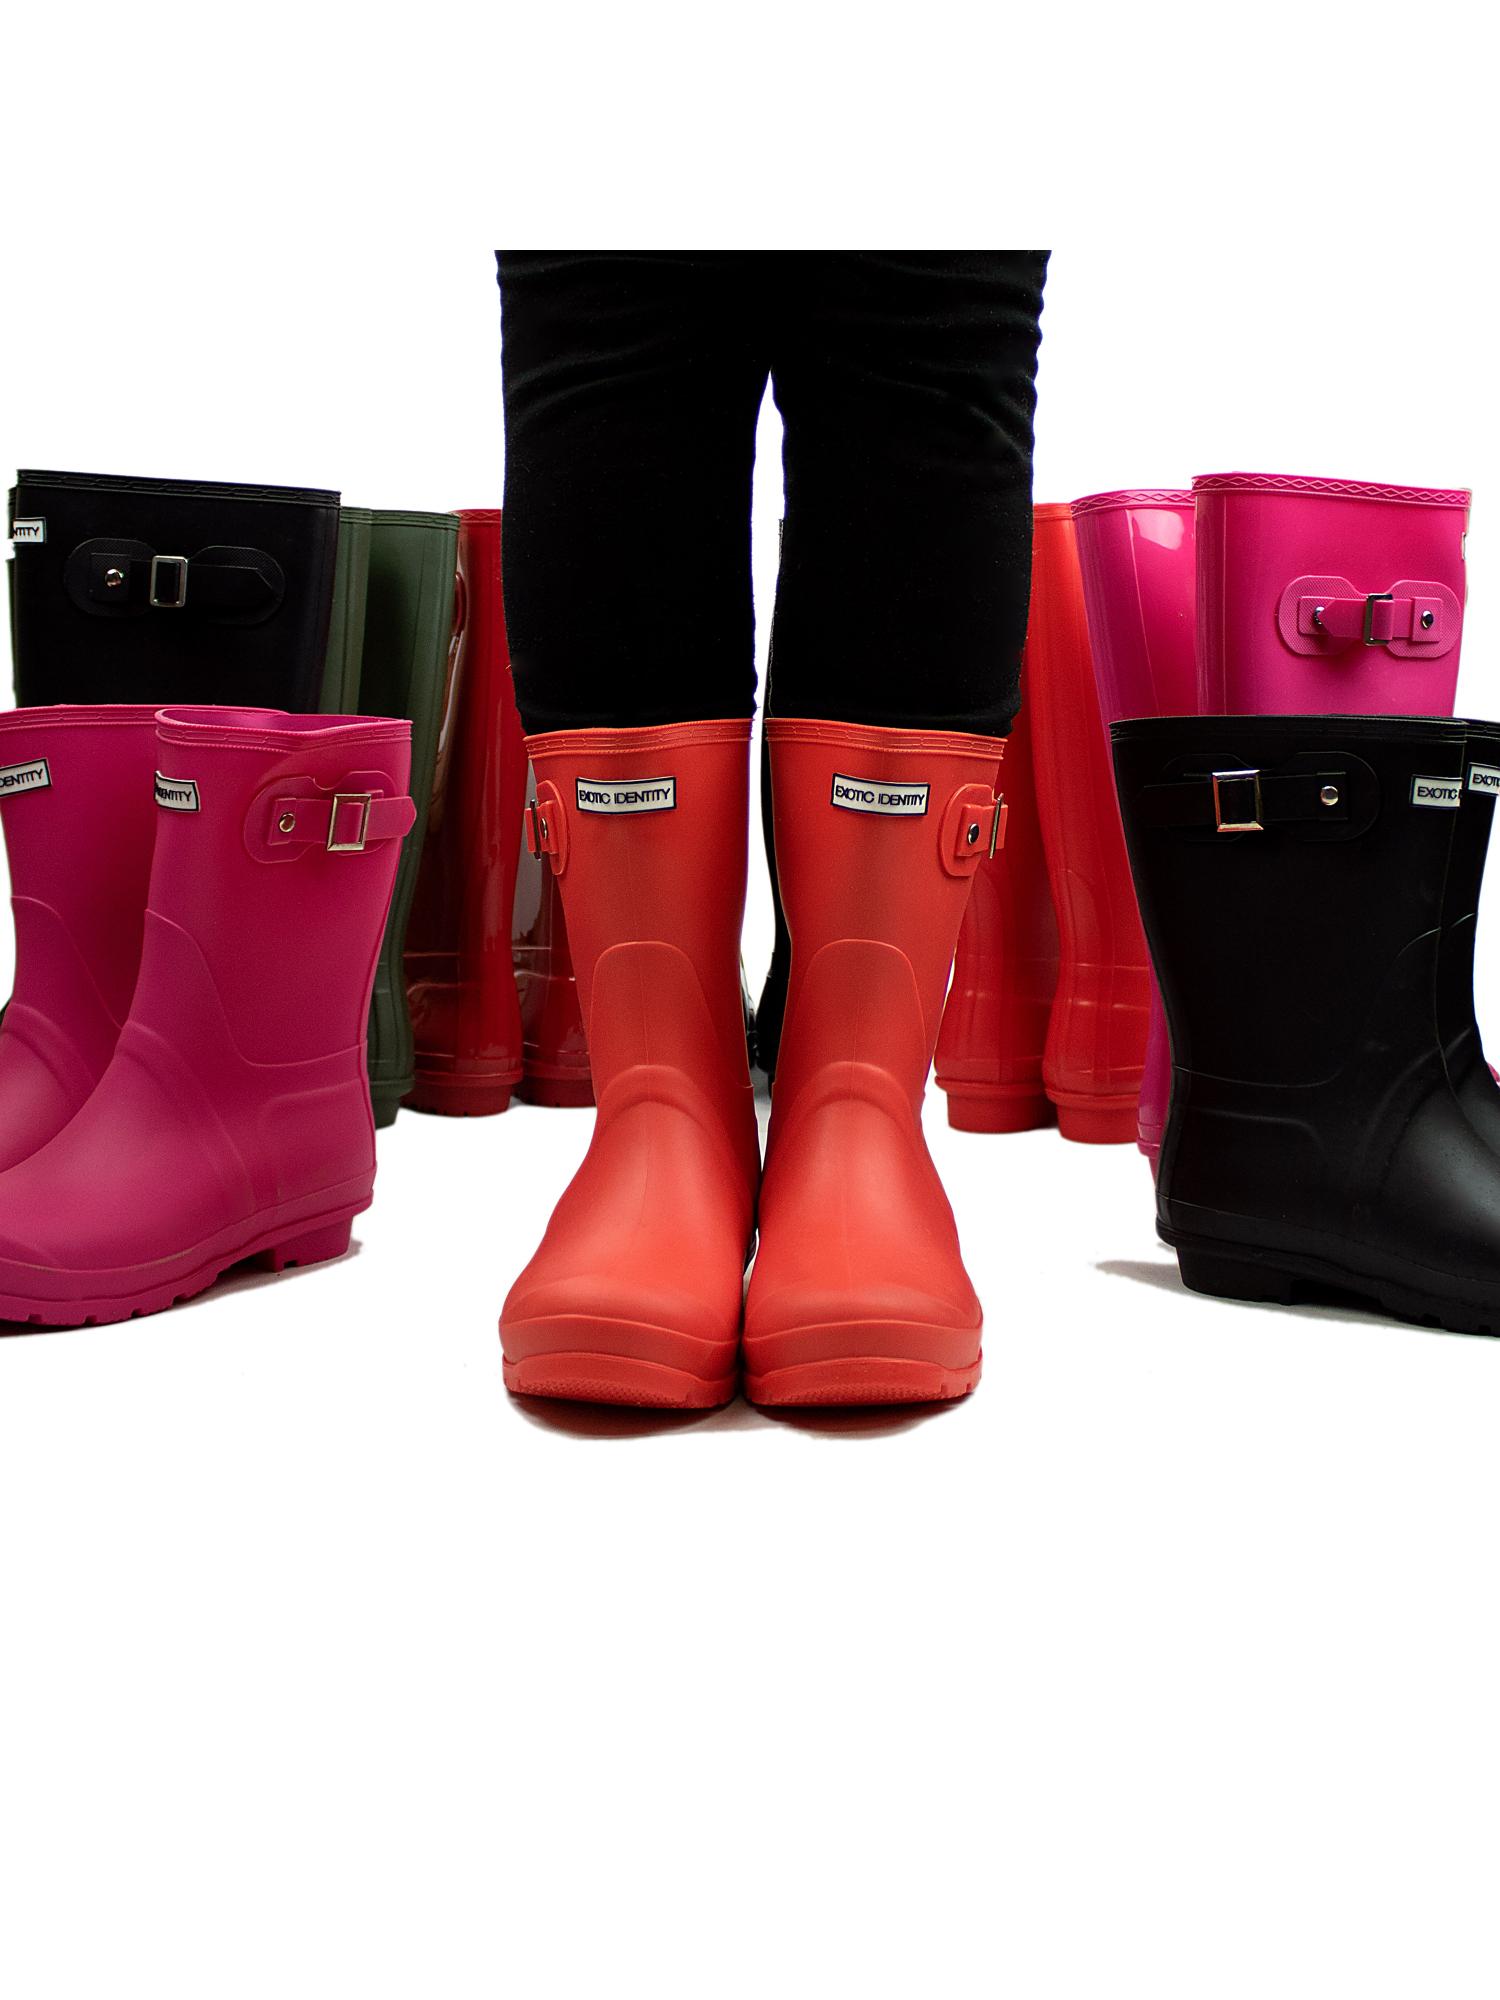 Exotic-Identity-Short-Rain-Boots-Non-Slip-100-Waterproof-for-Women thumbnail 8